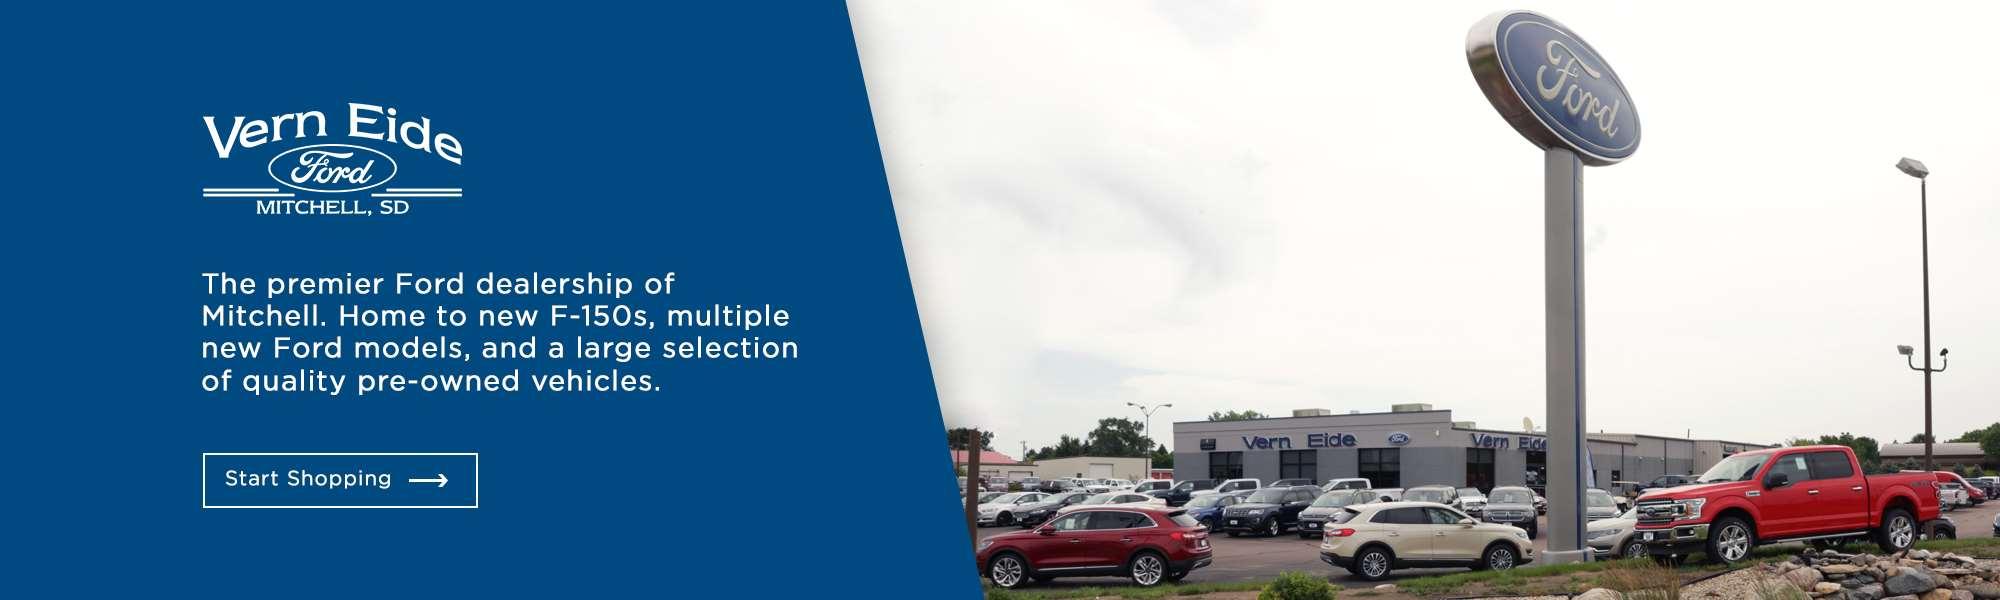 Vern Eide Motorcars | Sioux Falls, SD | Vern Eide